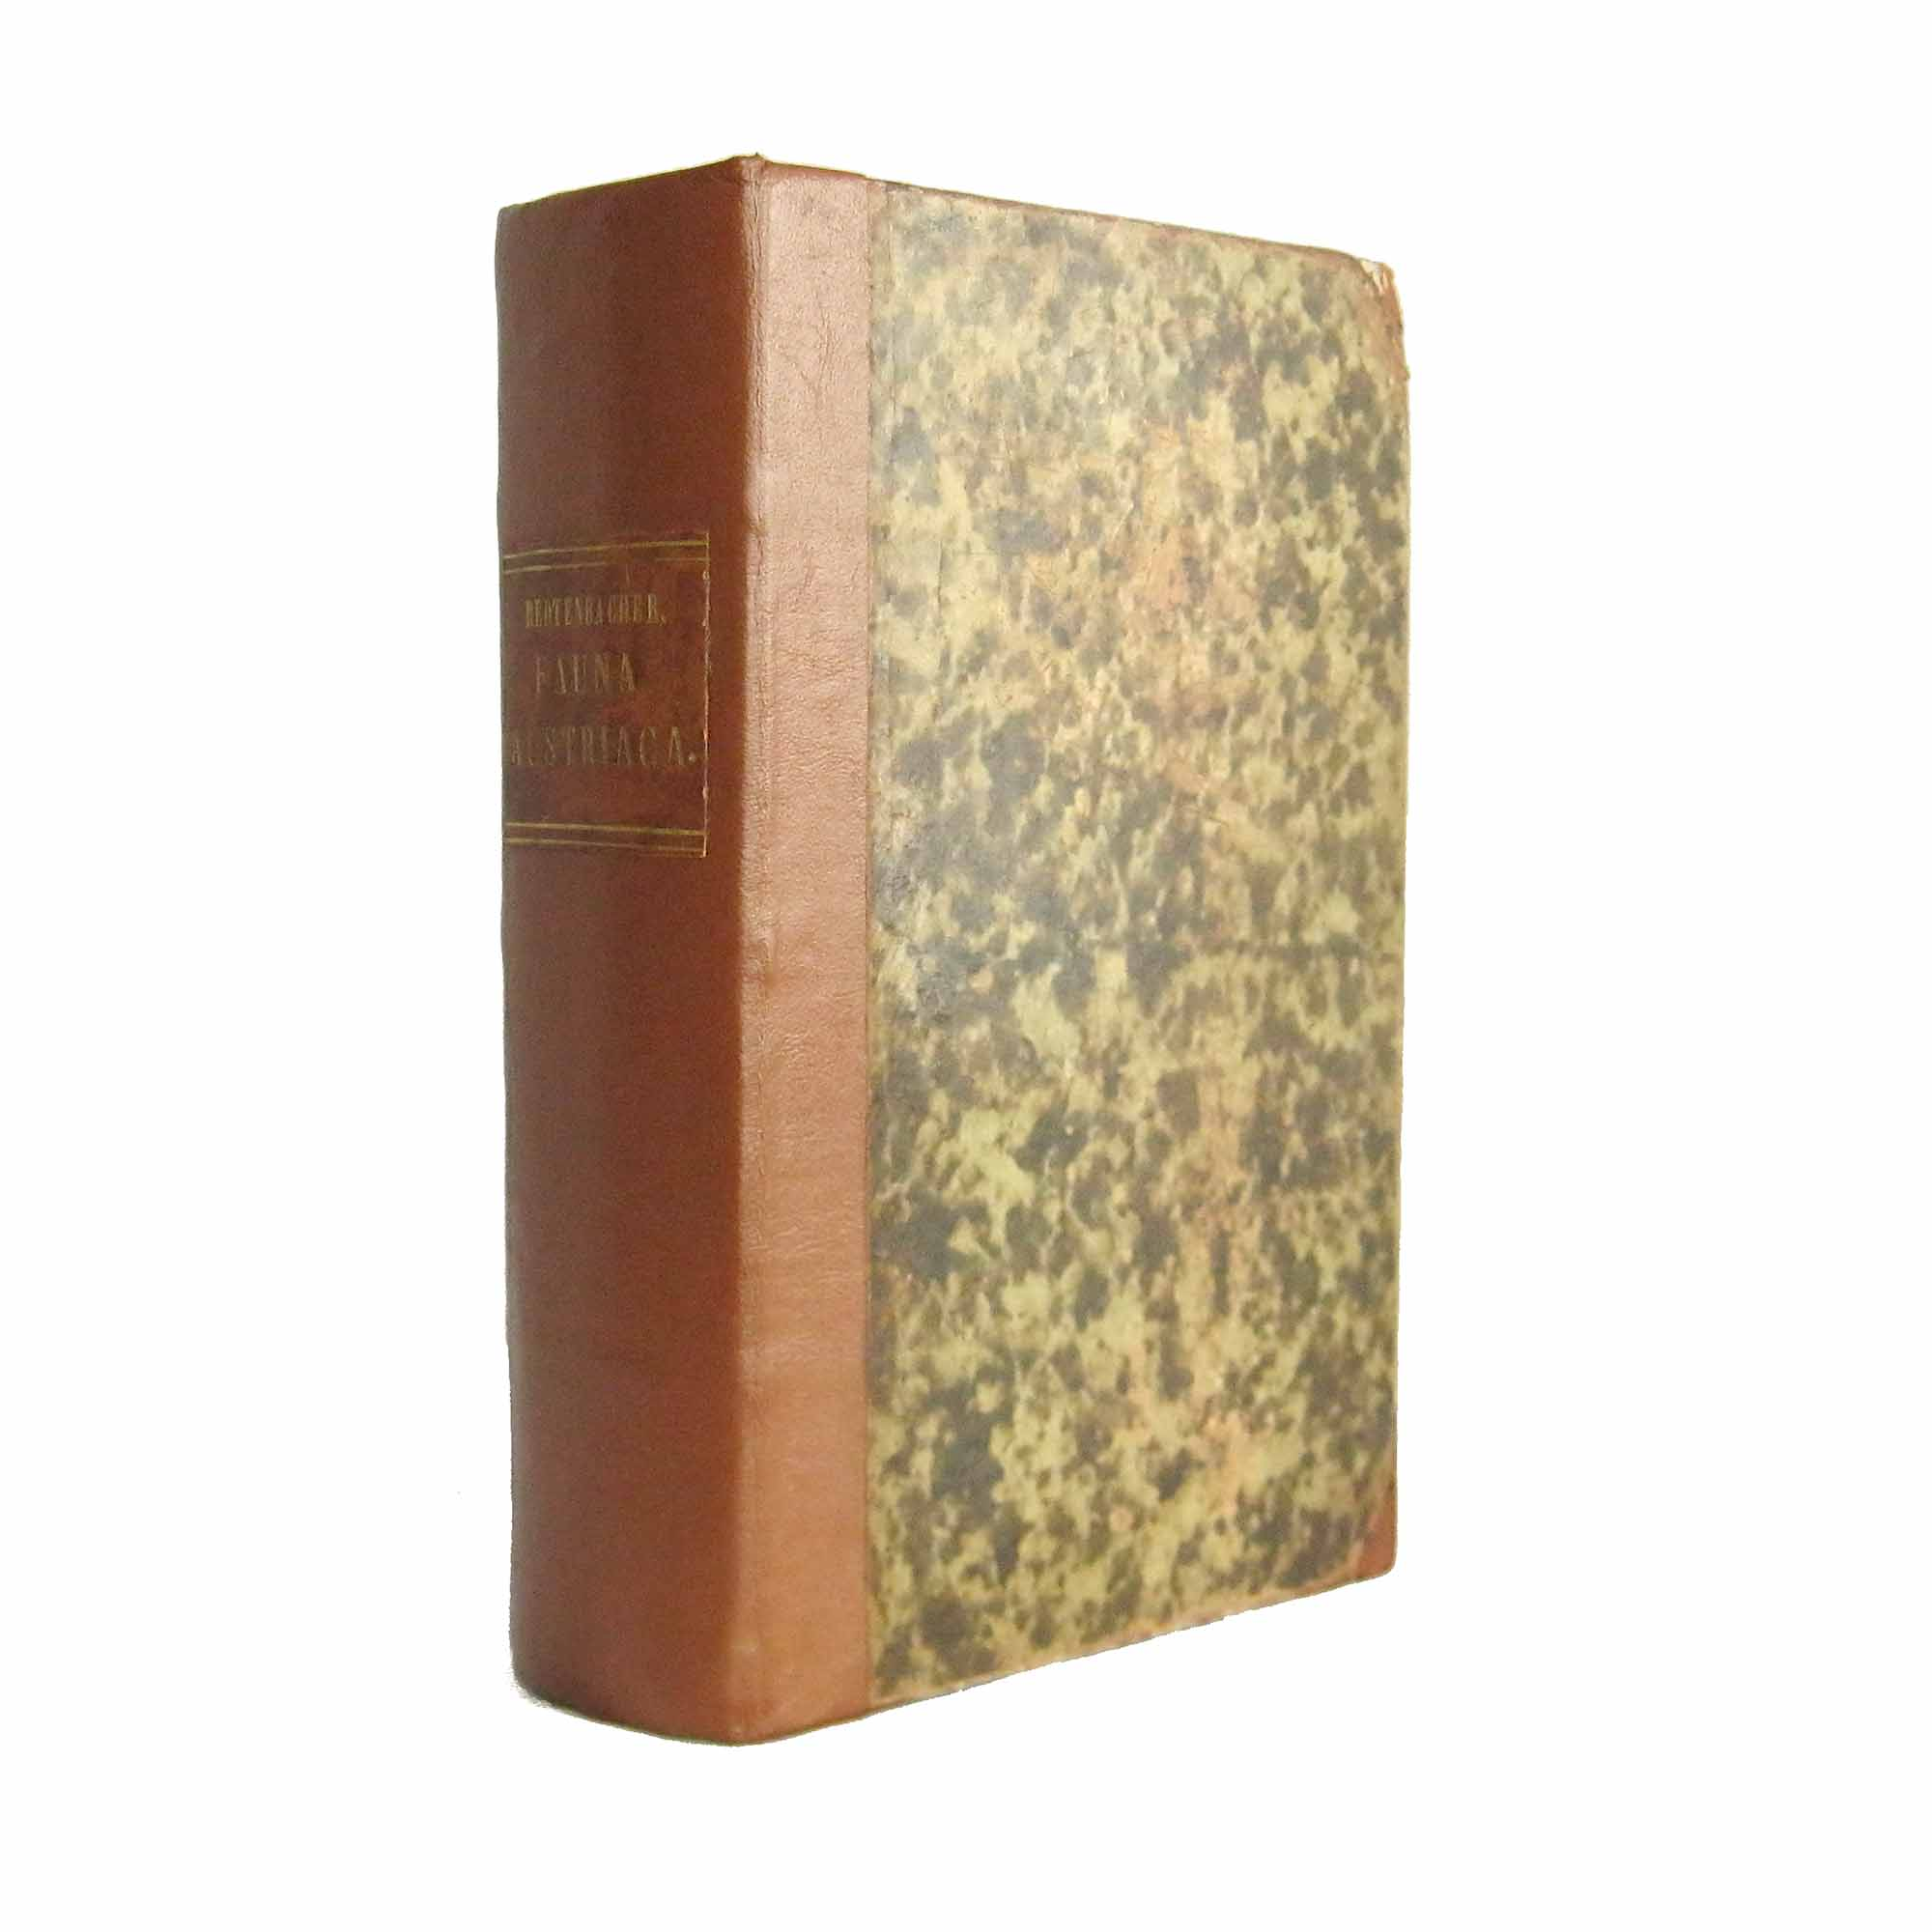 1099-Redtenbacher-Fauna-Austriaca-1858-Einband-frei-N.jpg